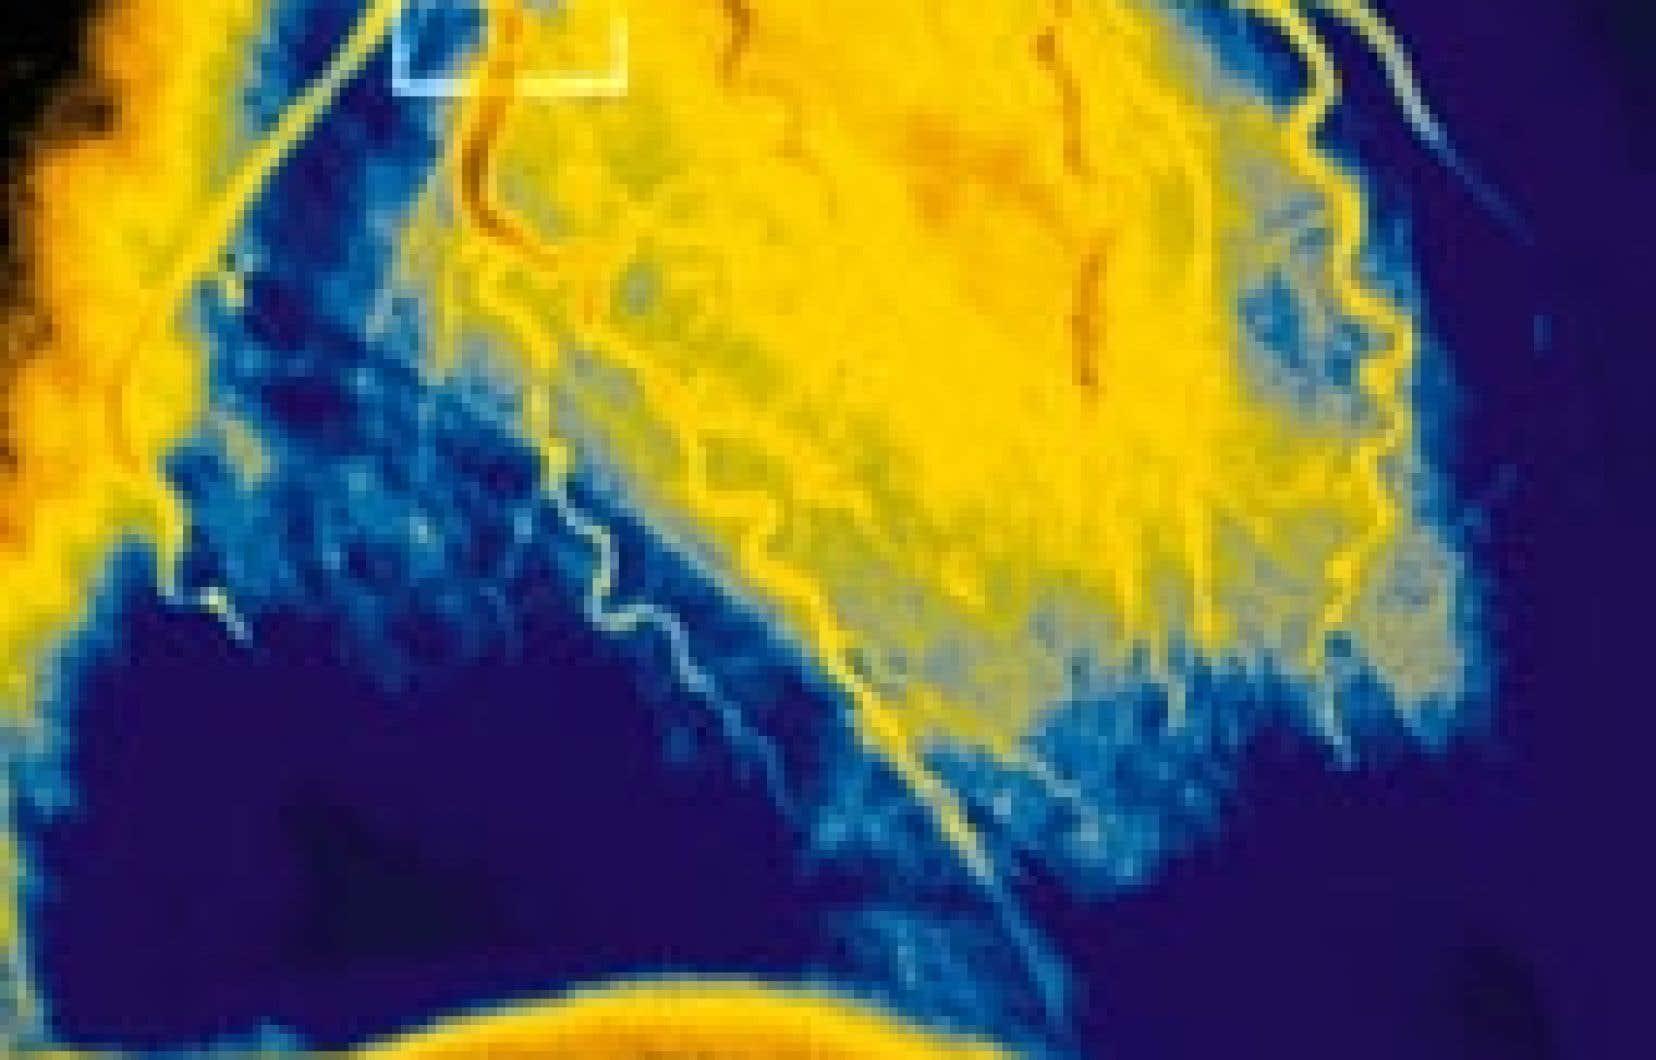 Angiographie d'un infarctus du myocarde. Source: Newscom